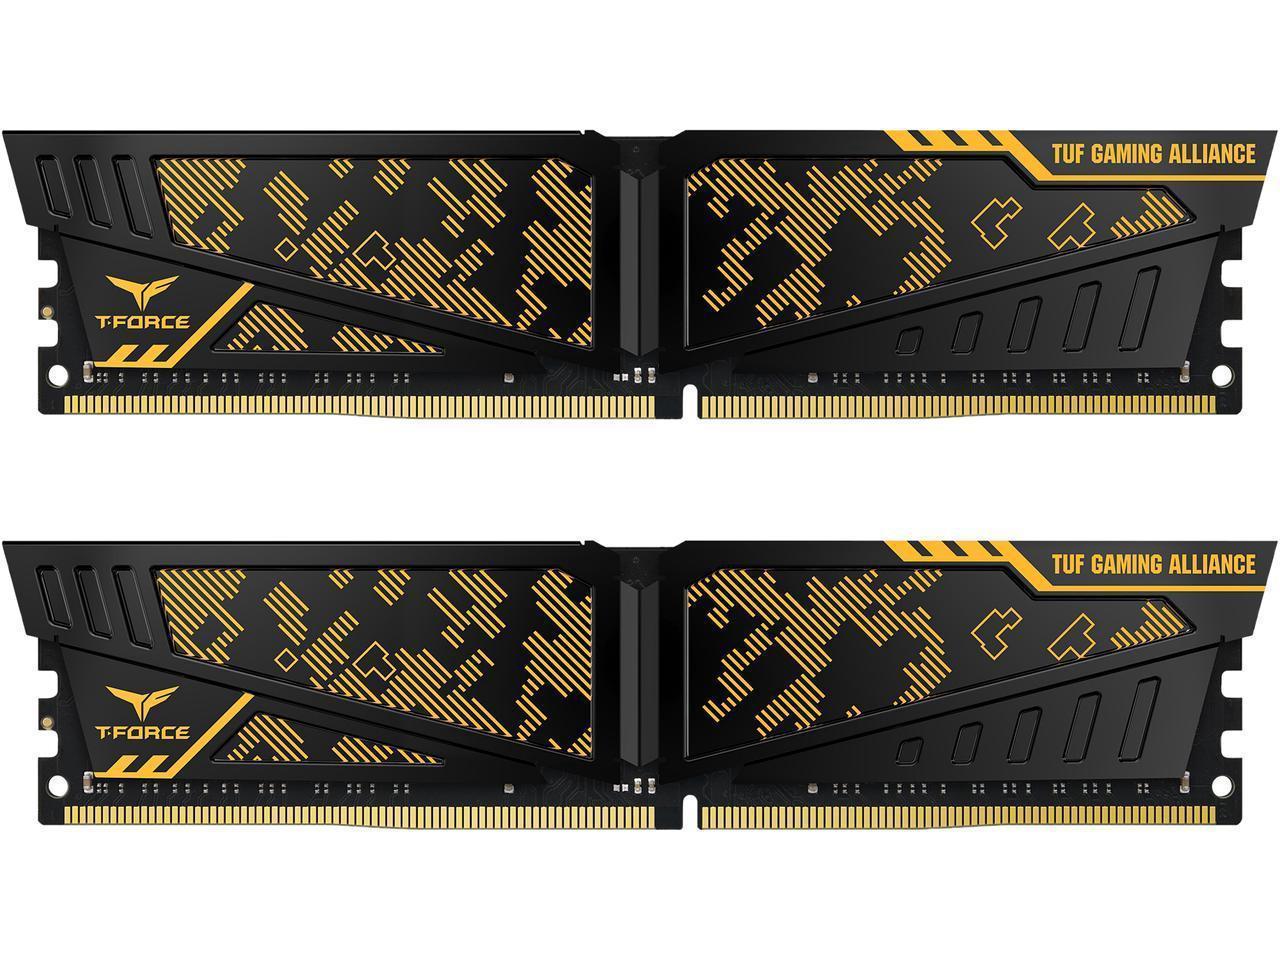 2x8GB Team VULCAN TUF Gaming Alliance 3600MHz DDR4 Gaming RAM image